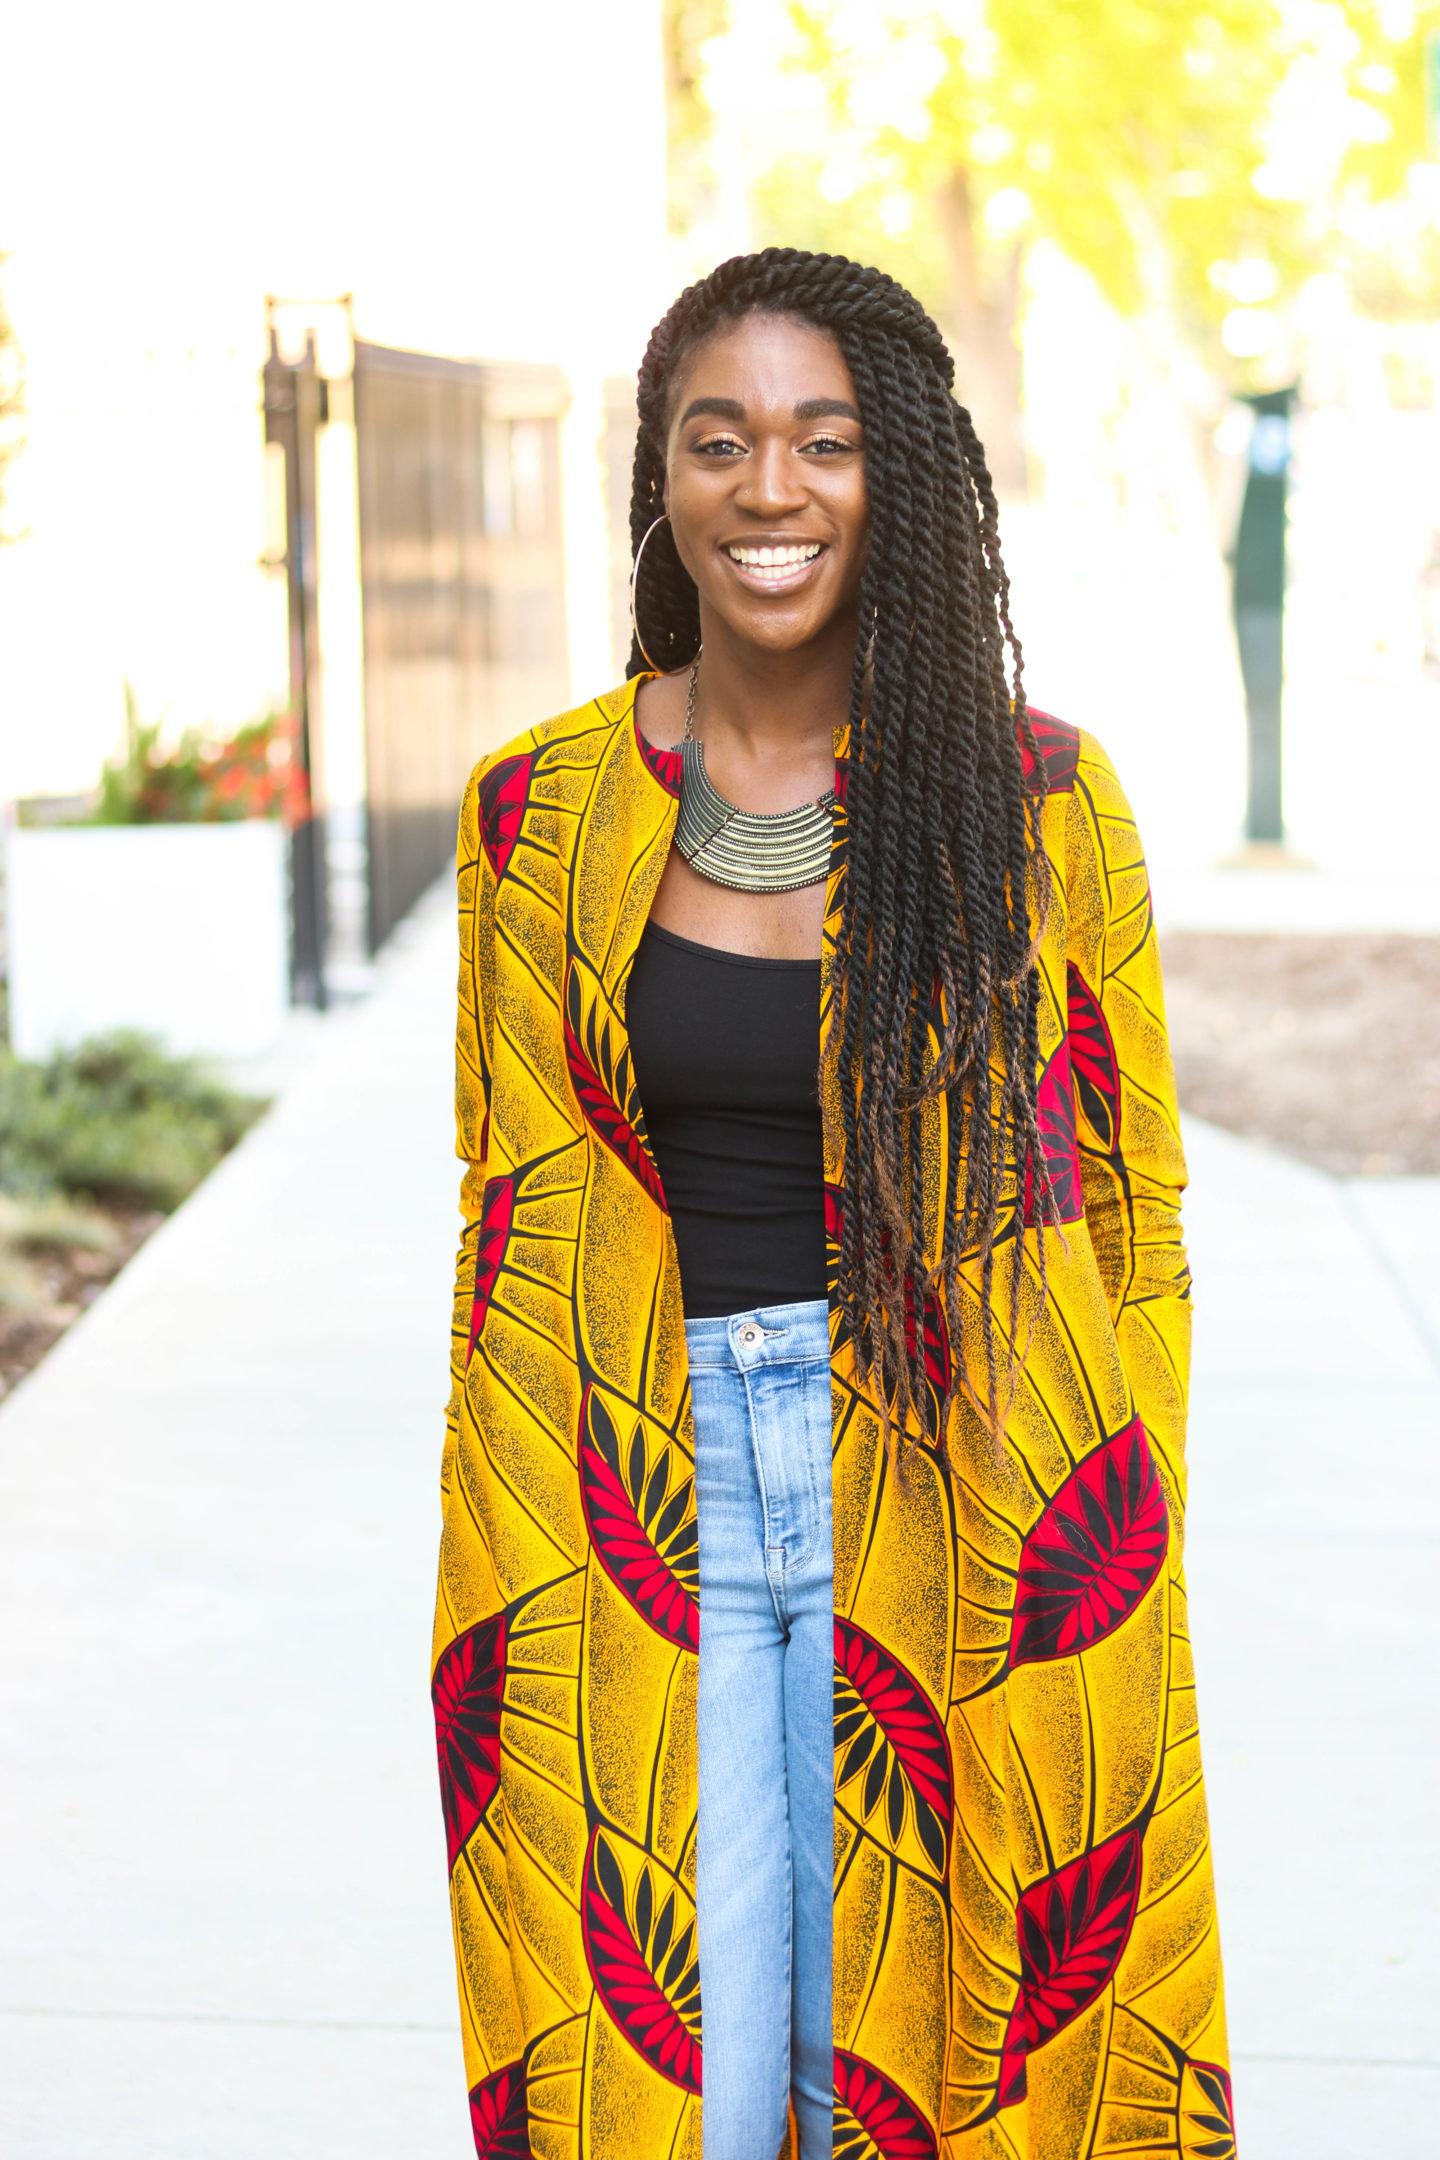 African Print Duster, African Print Cardigan, DIY Duster, DIY Coat, DIY Jacket, African Print Fashion, Long Cardigan, Fall Fashion, Ankara Fashion, Ankara Coat, Ankara Duster